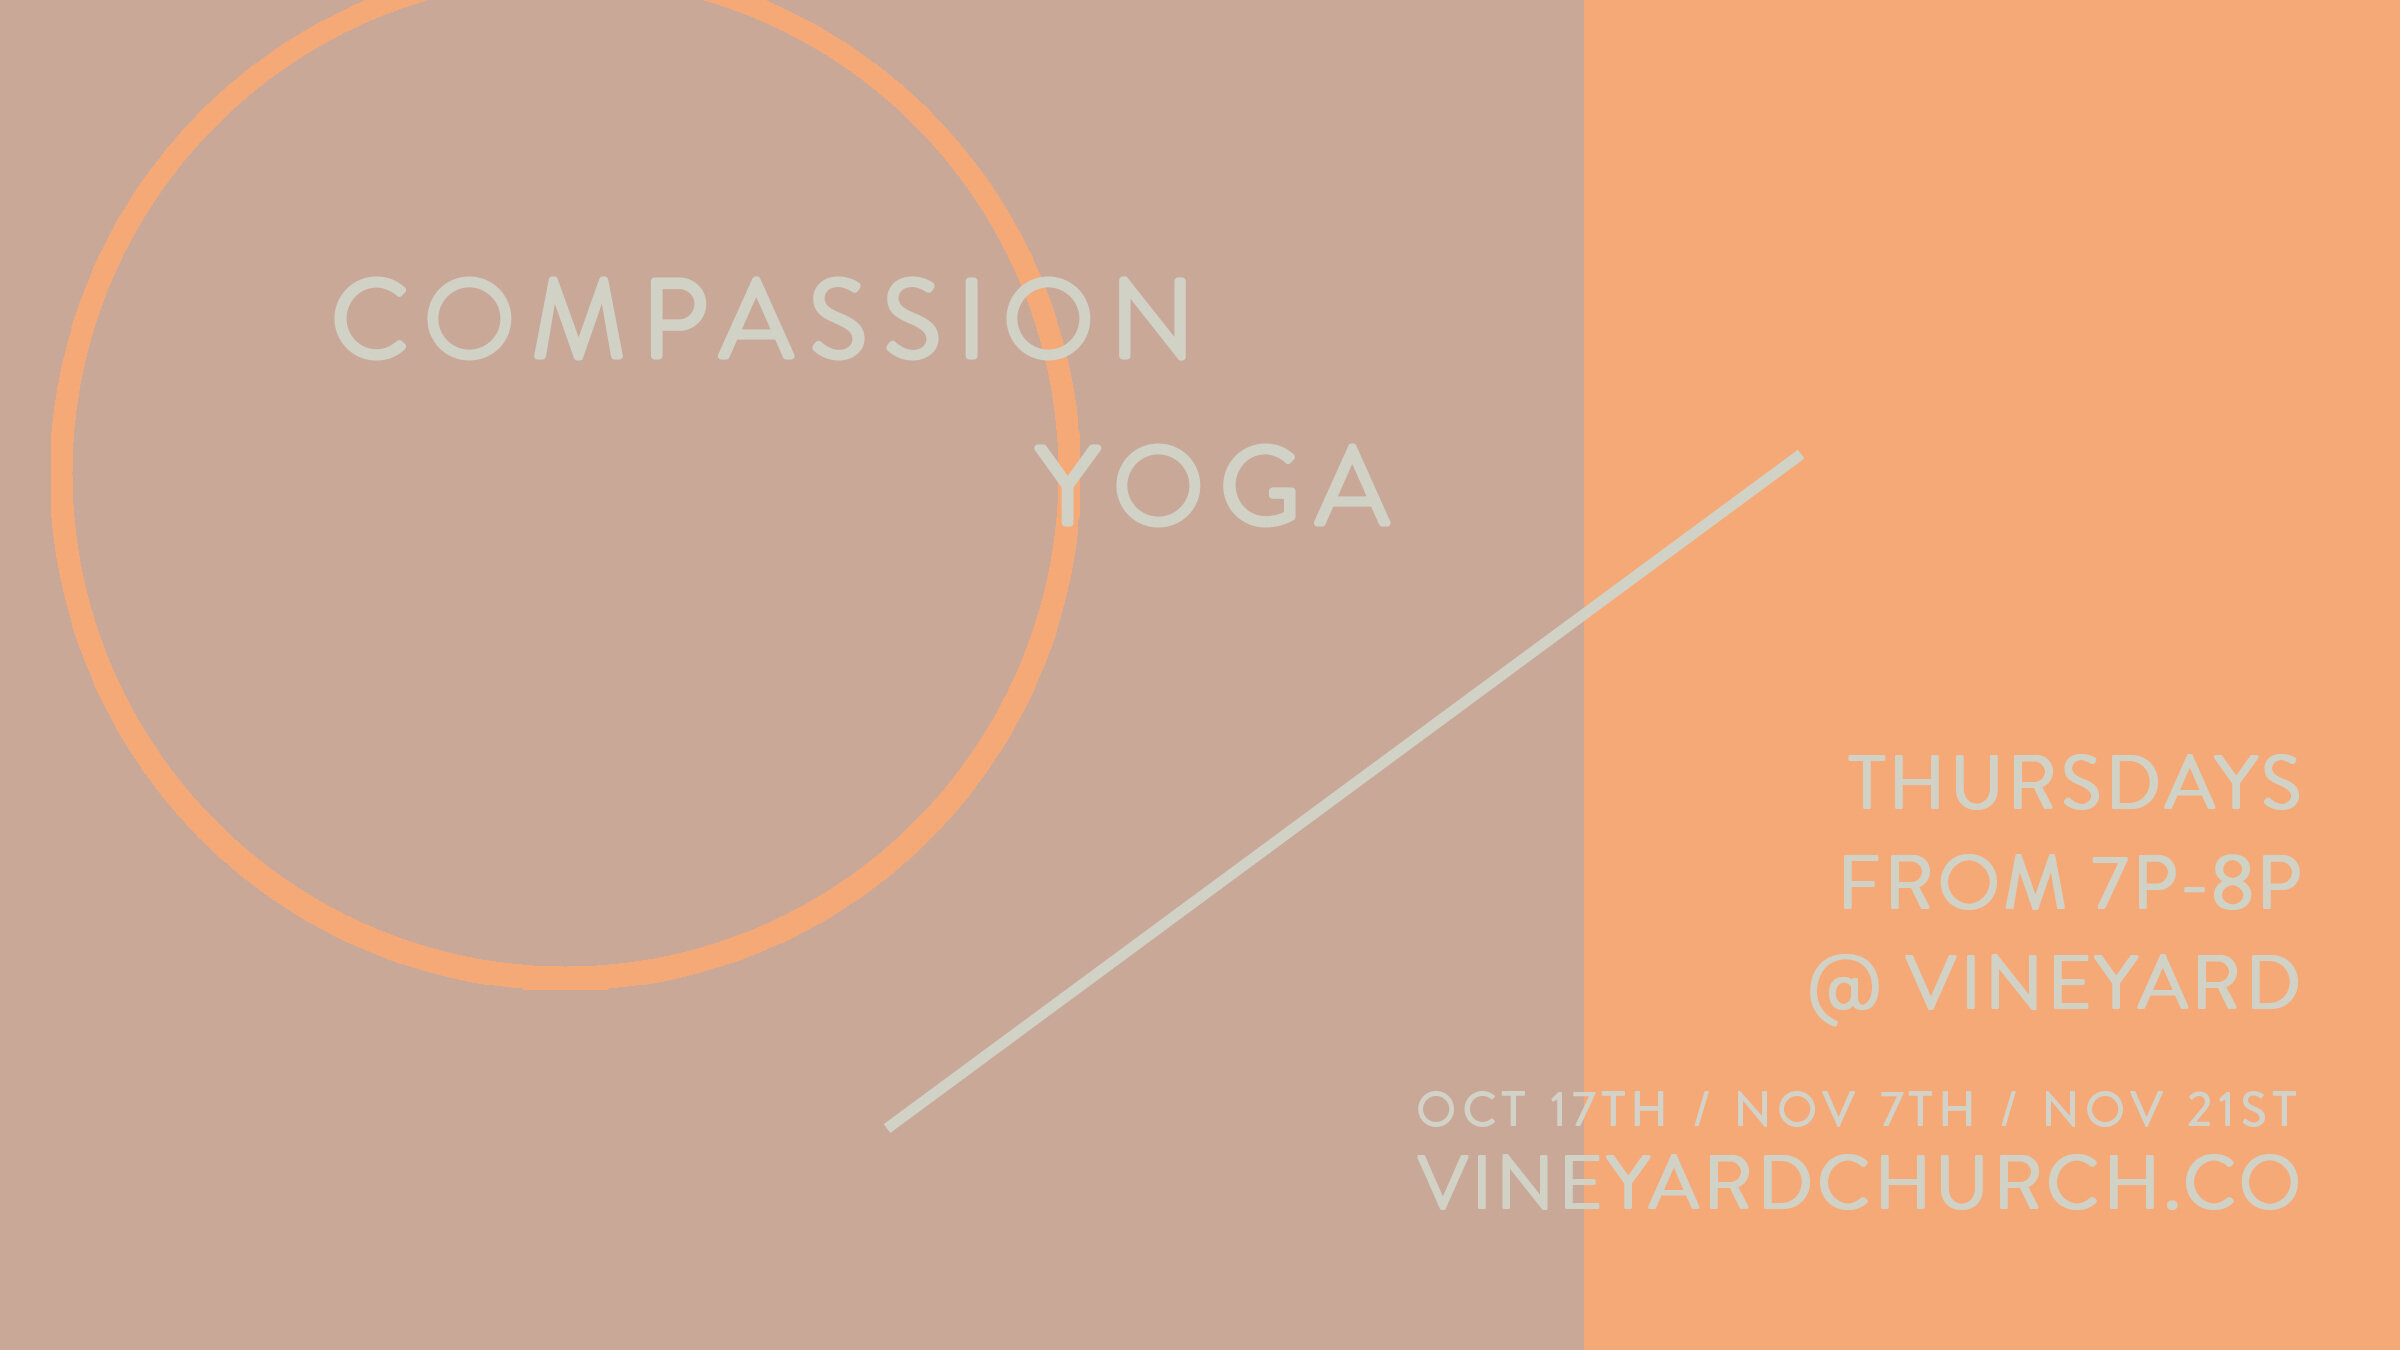 COMPASSION-YOGA.jpg